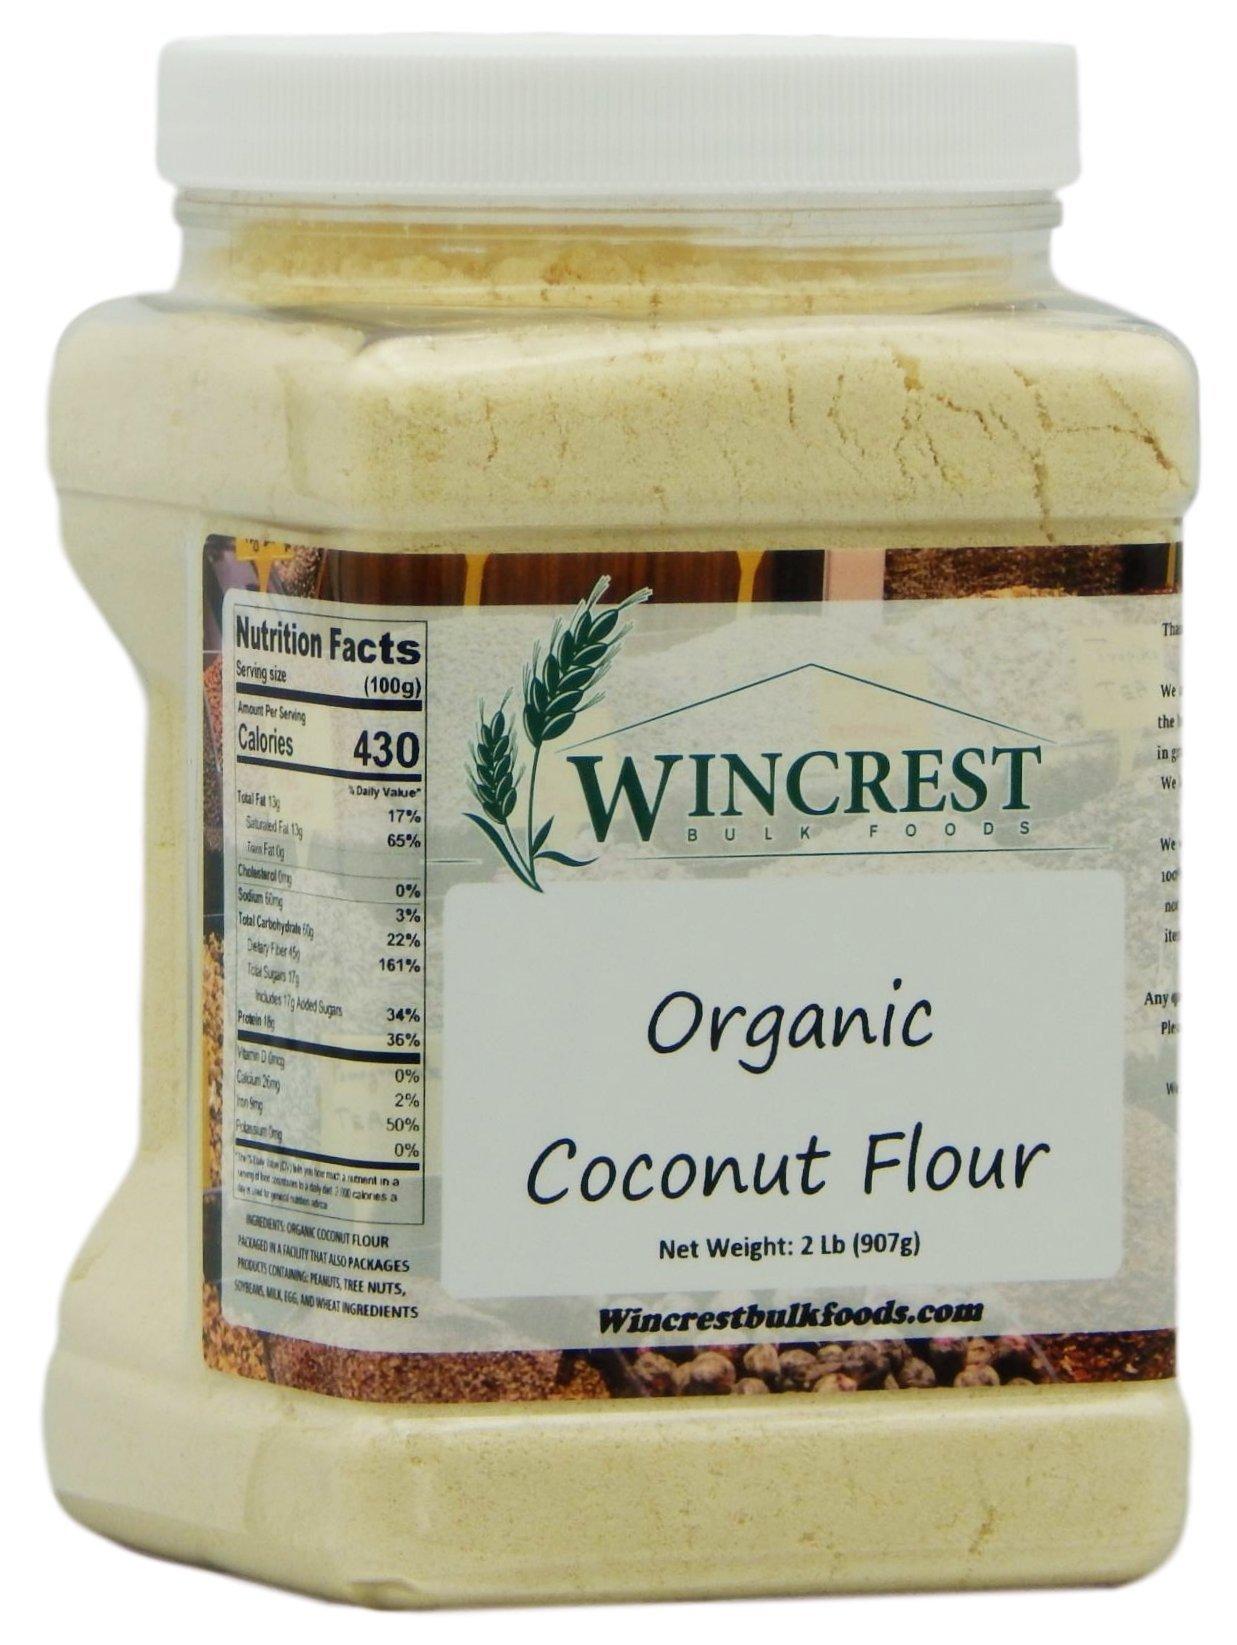 Organic Coconut Flour - 2 Lb Tub